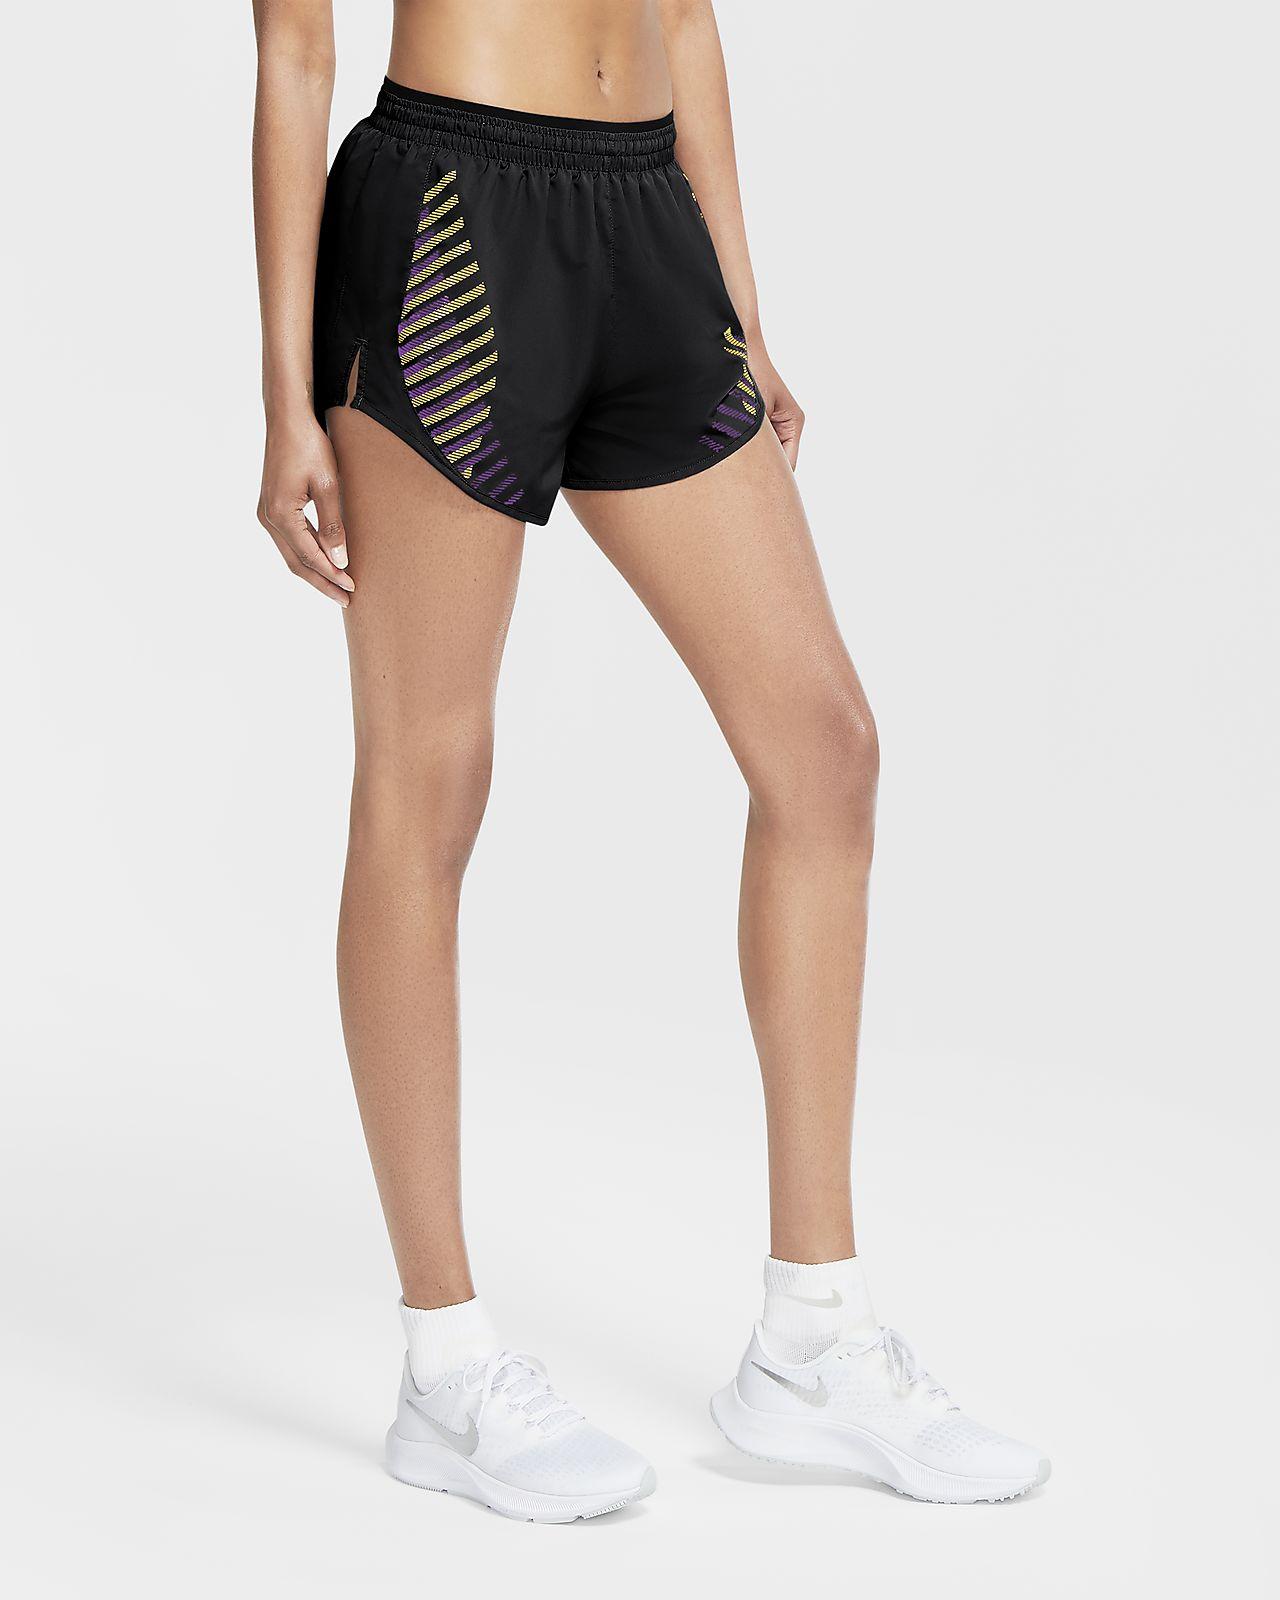 Damskie spodenki do biegania Nike Tempo Luxe